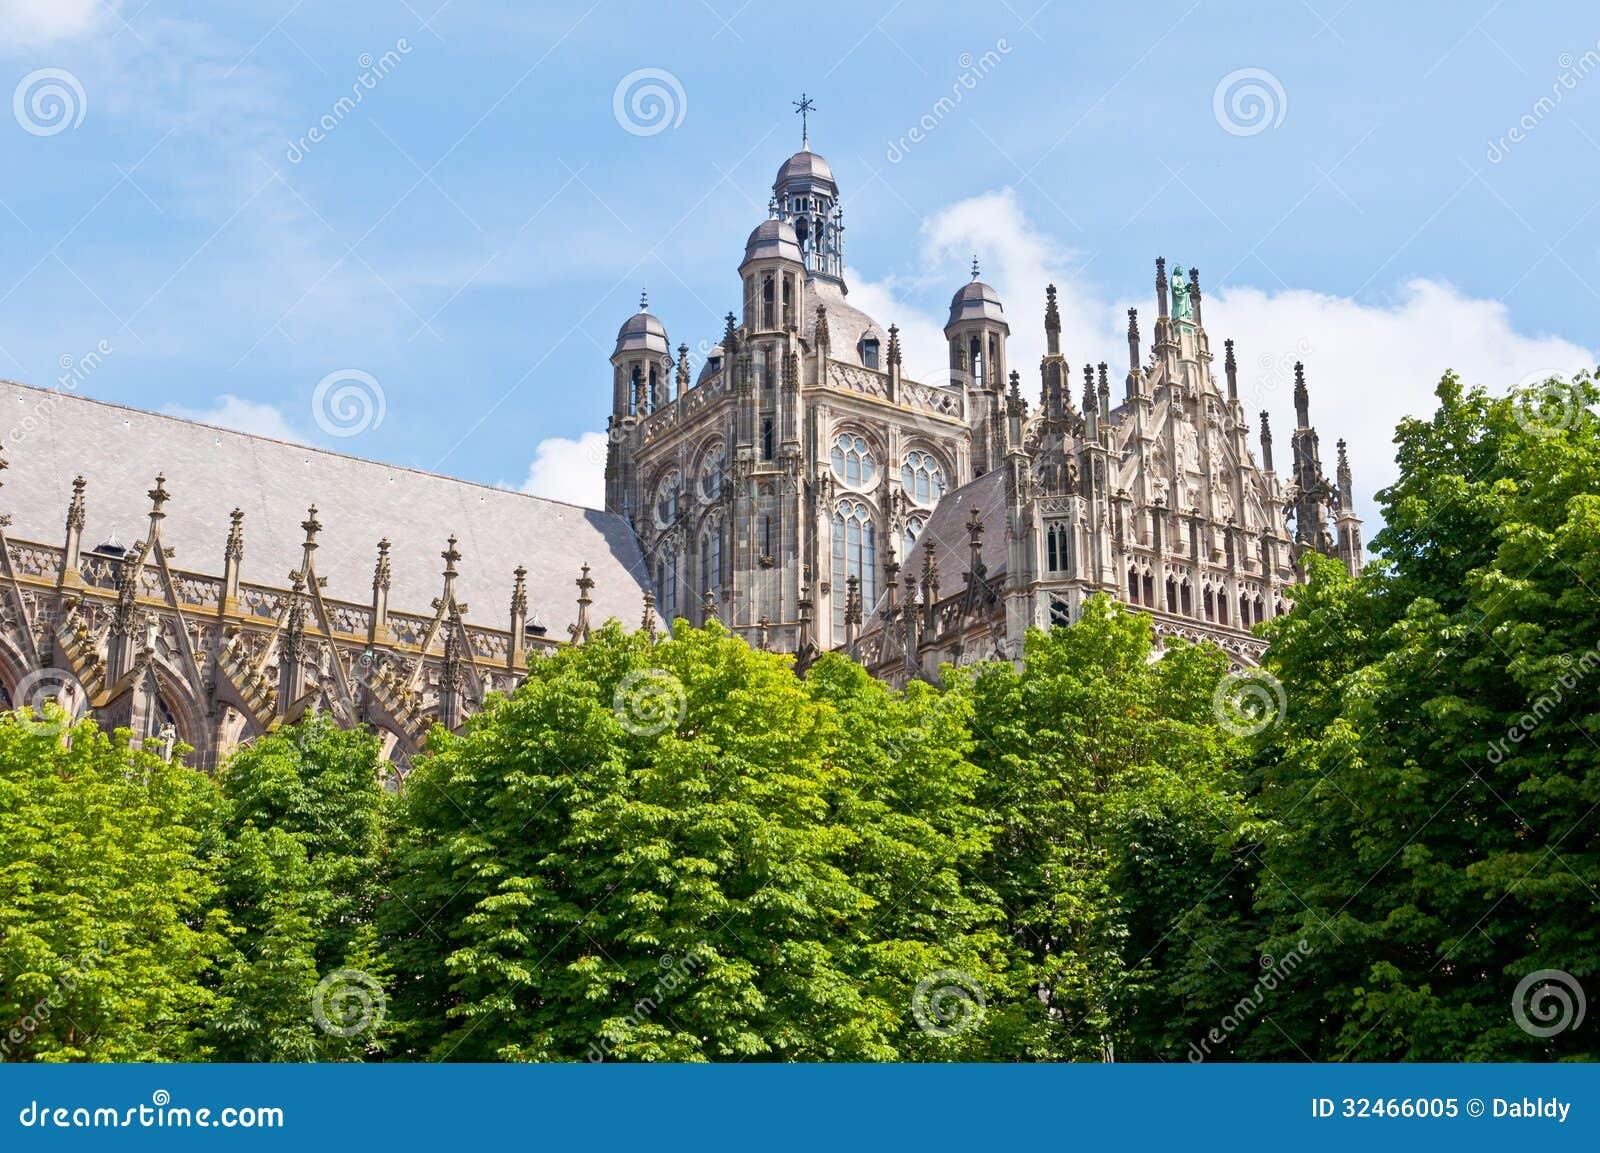 #1D65AE22208464 Beautiful Gothic Style Cathedral In Den Bosch Netherlands Royalty  Van de bovenste plank Design Meubelzaken Den Bosch 2713 beeld 13009532713 Inspiratie